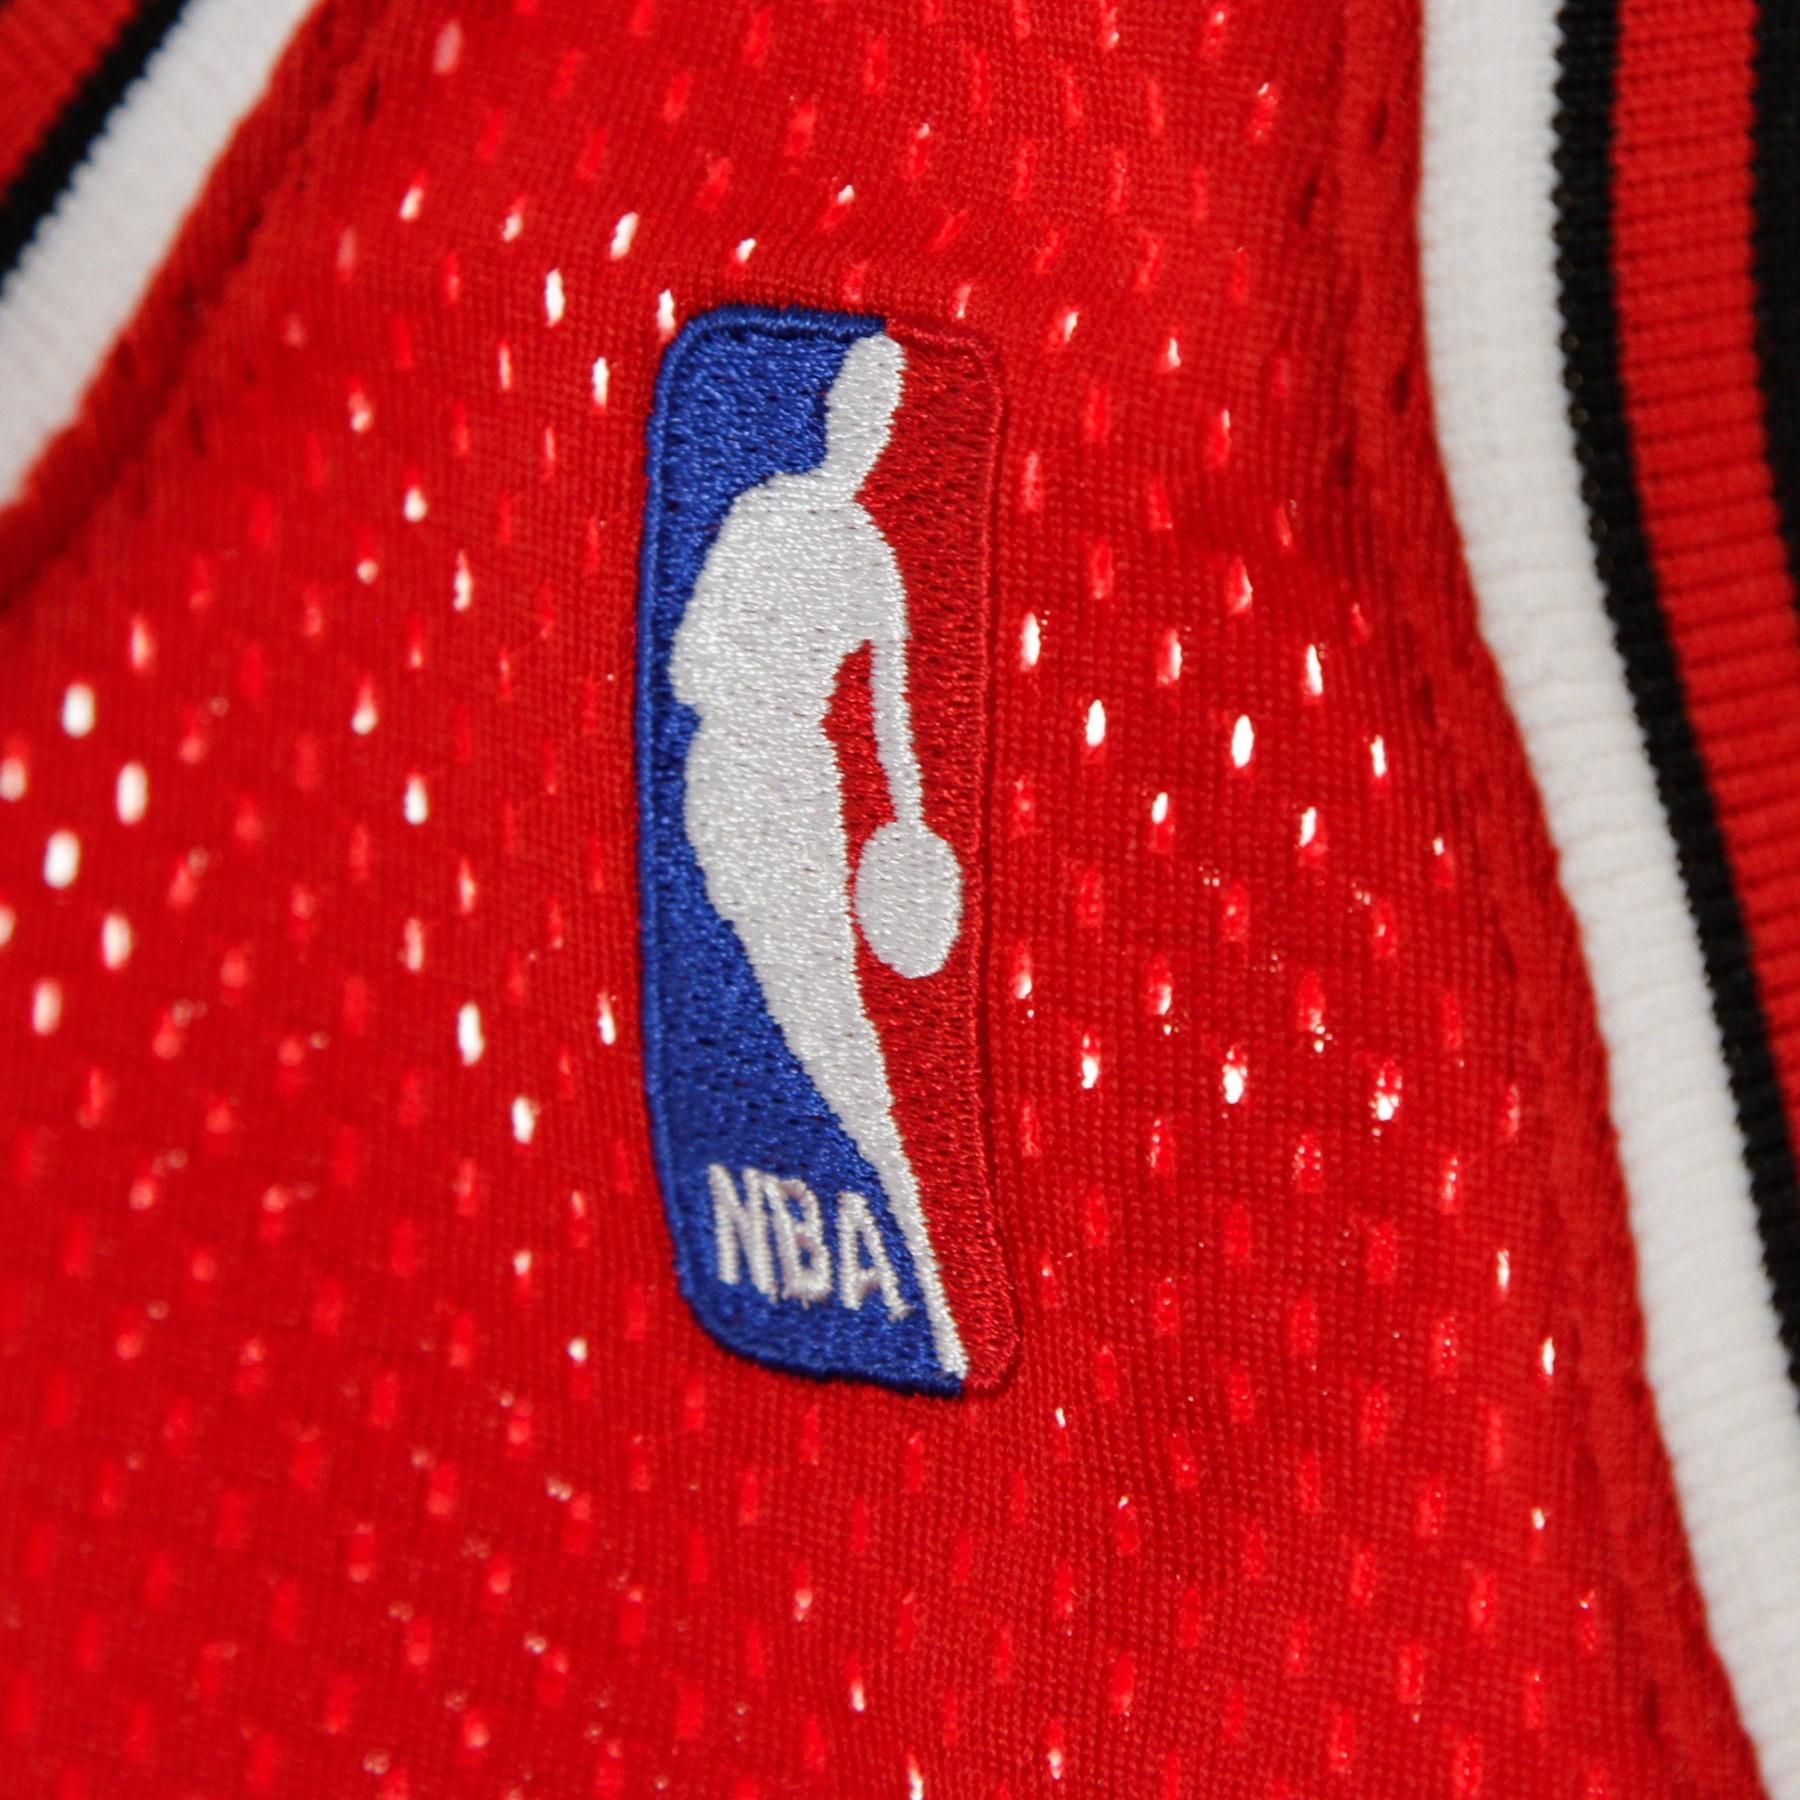 CANOTTA BASKET NBA AUTHENTIC JERSEY MICHAEL JORDAN NO23 1988-89 CHIBUL ROAD